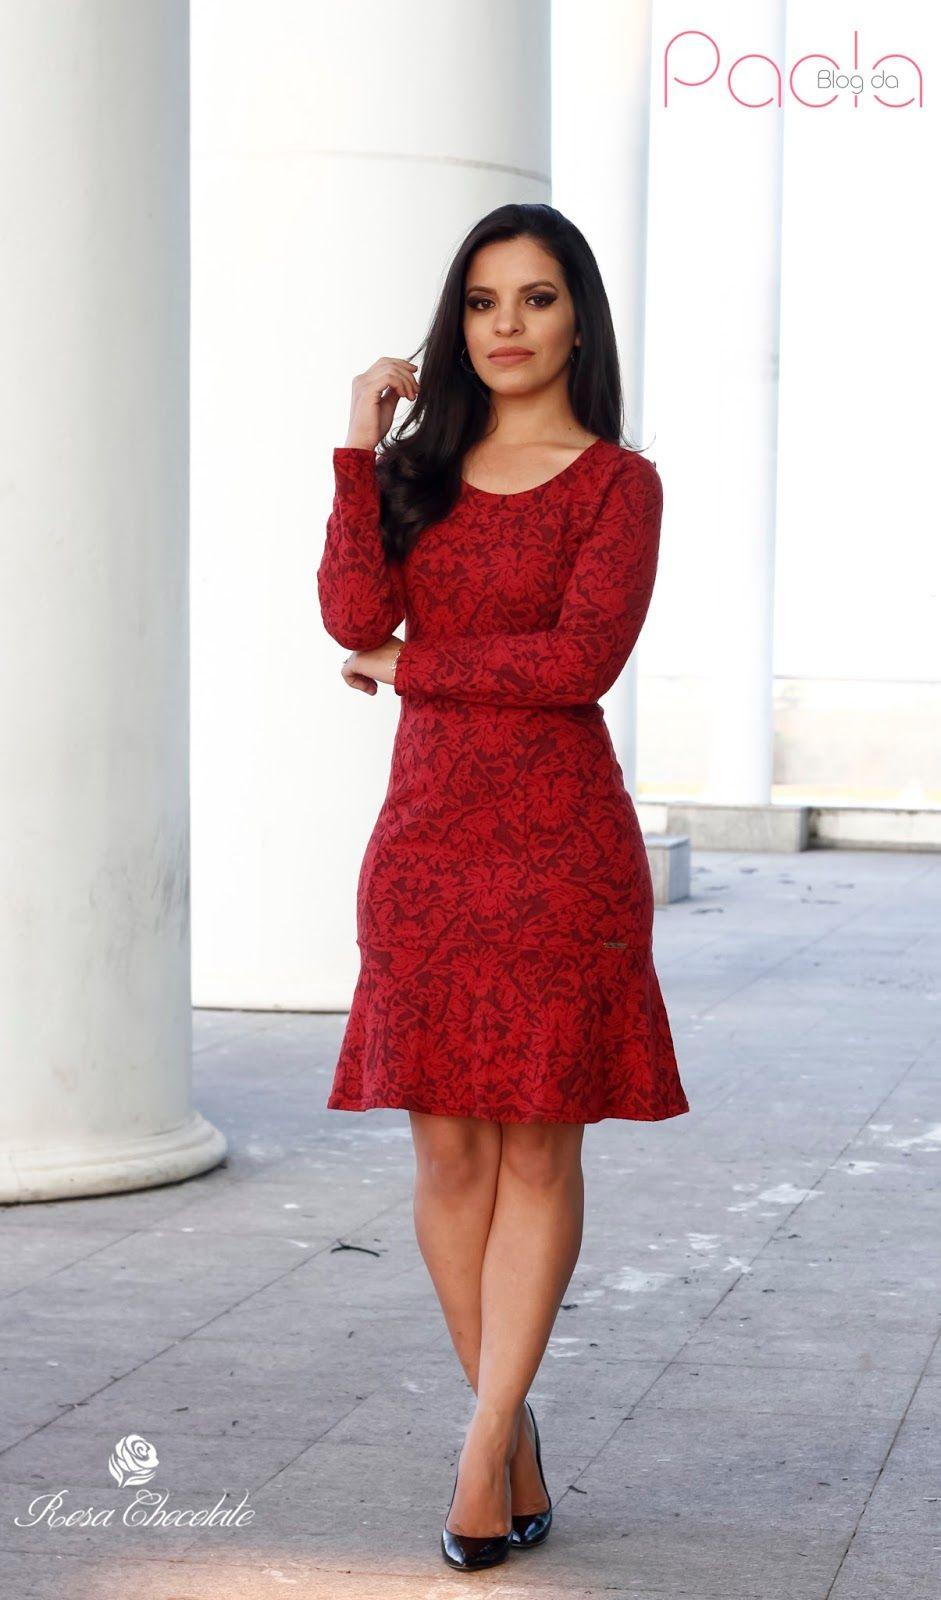 7934f76ff Blog da Paola  Look do Dia  Vestido Marsala – Rosa Chocolate